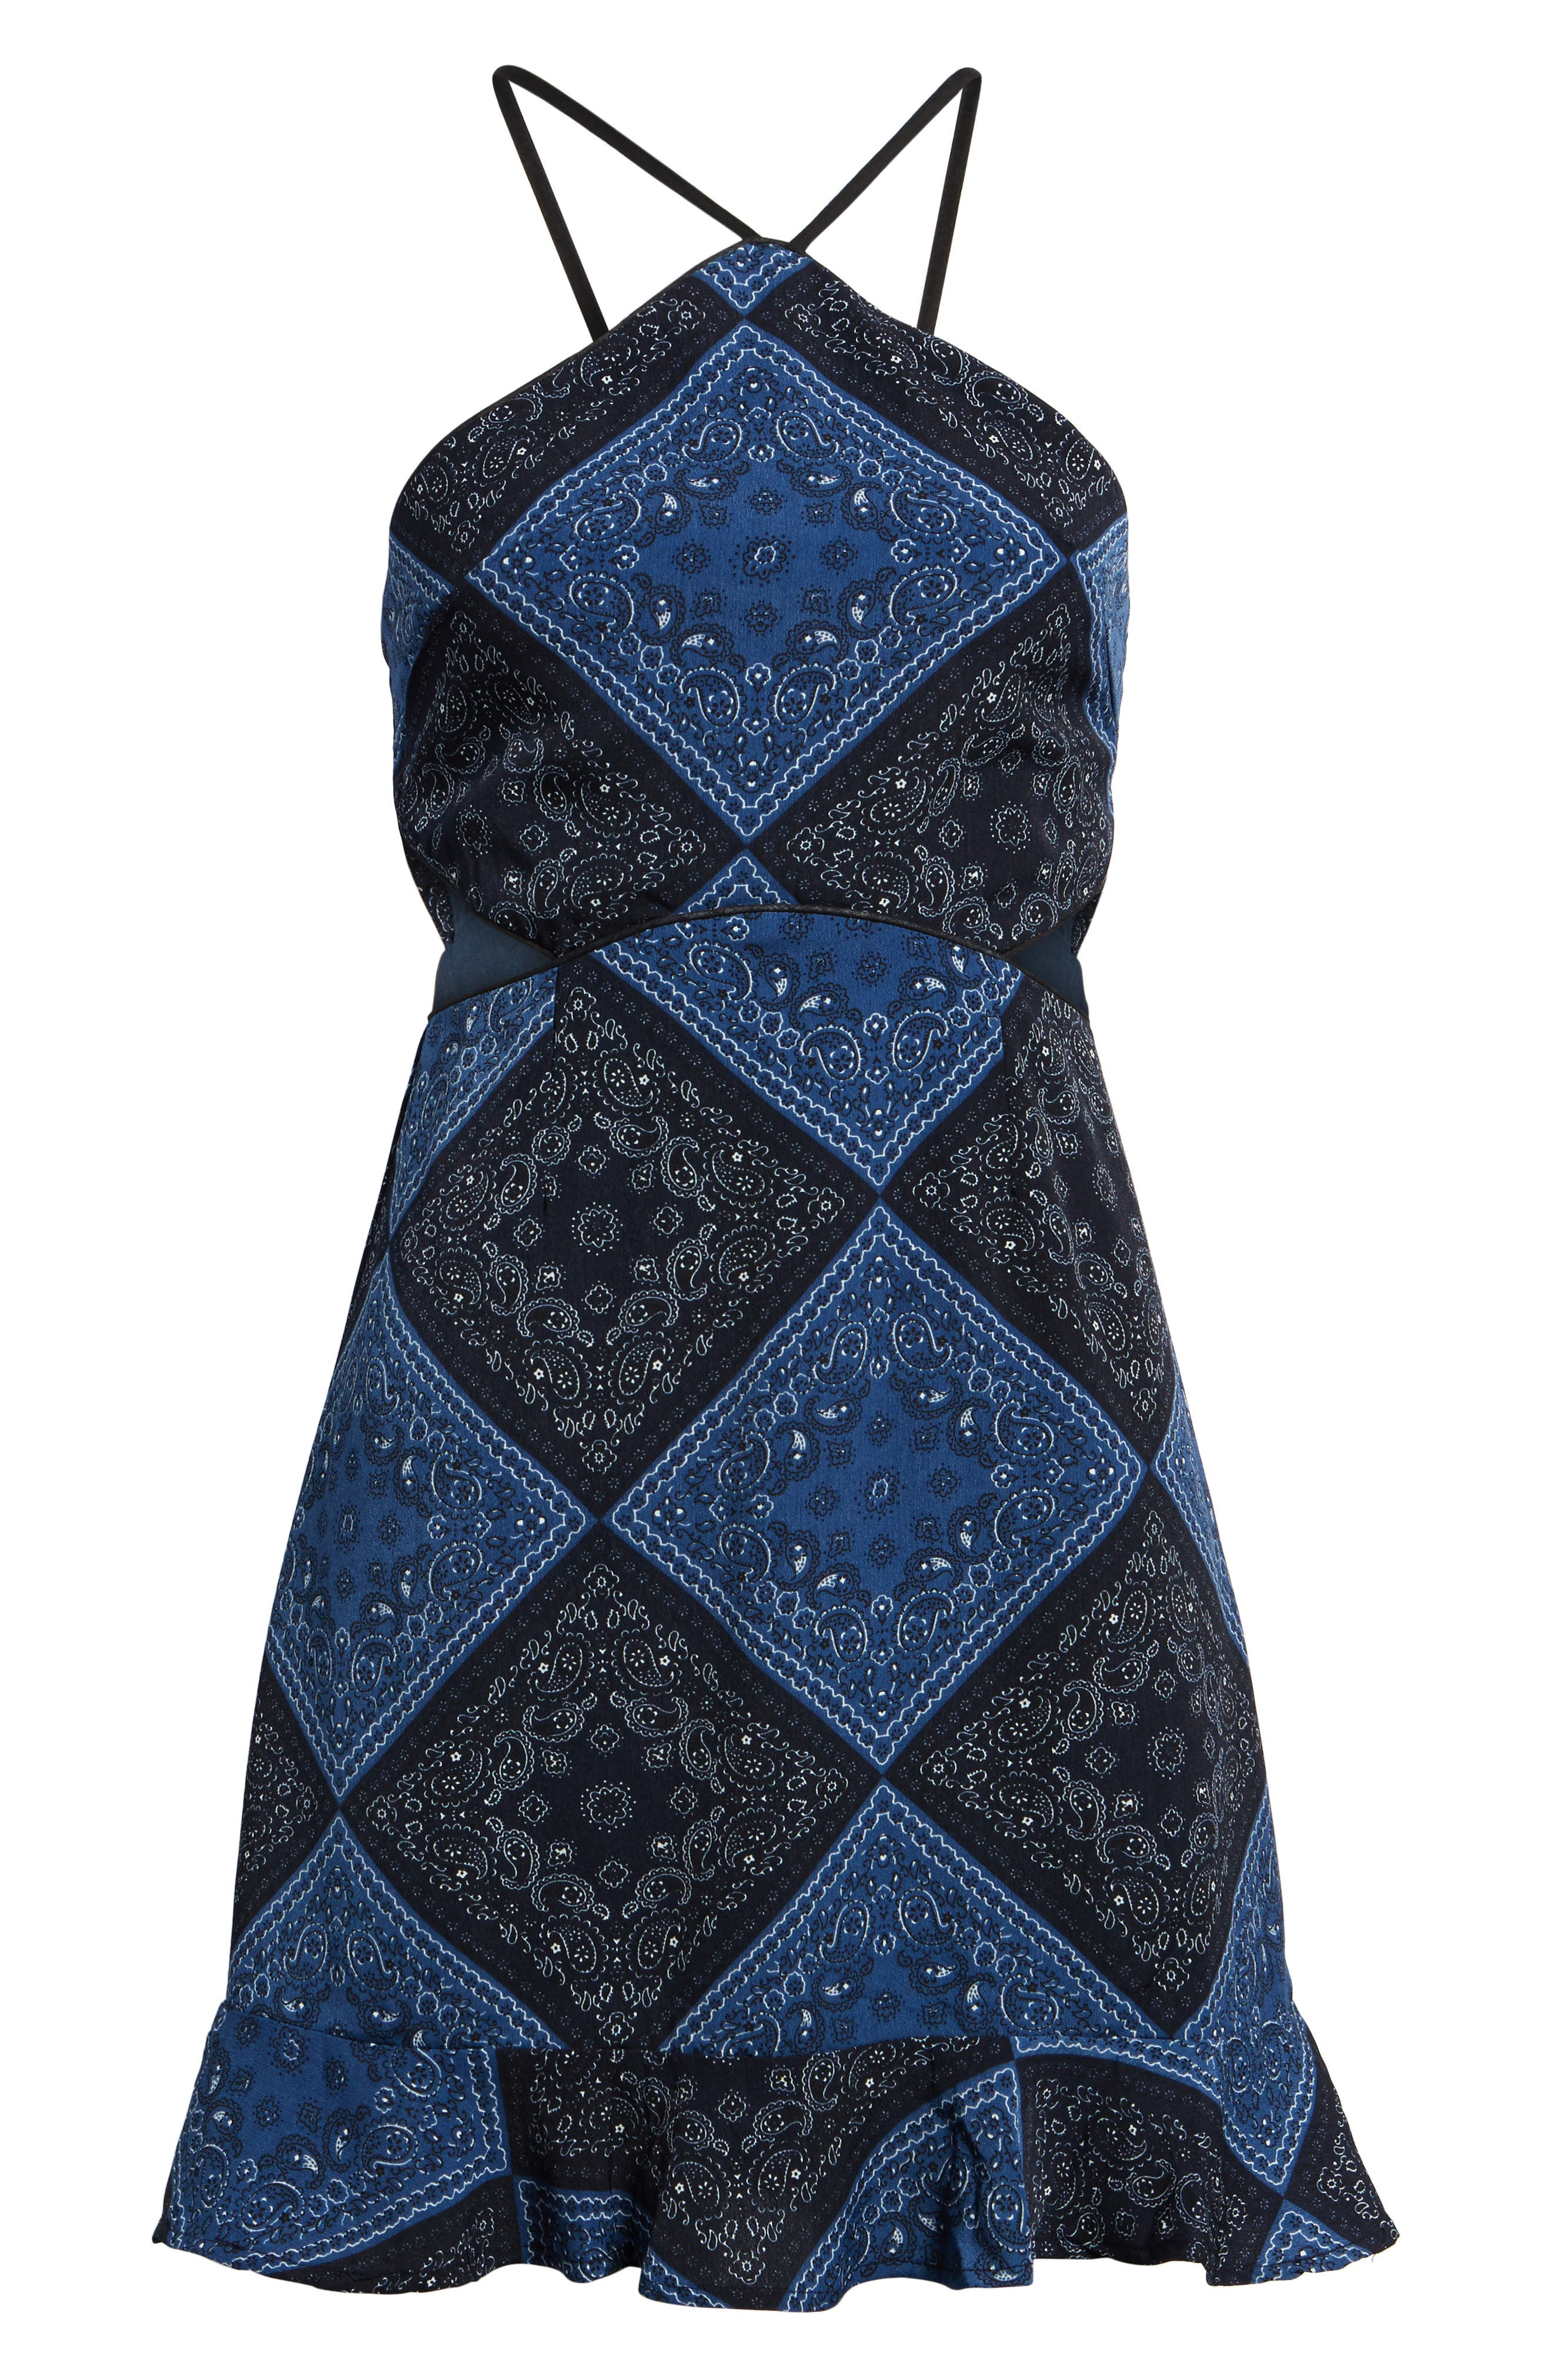 Bandana Bella Dress,                             Alternate thumbnail 11, color,